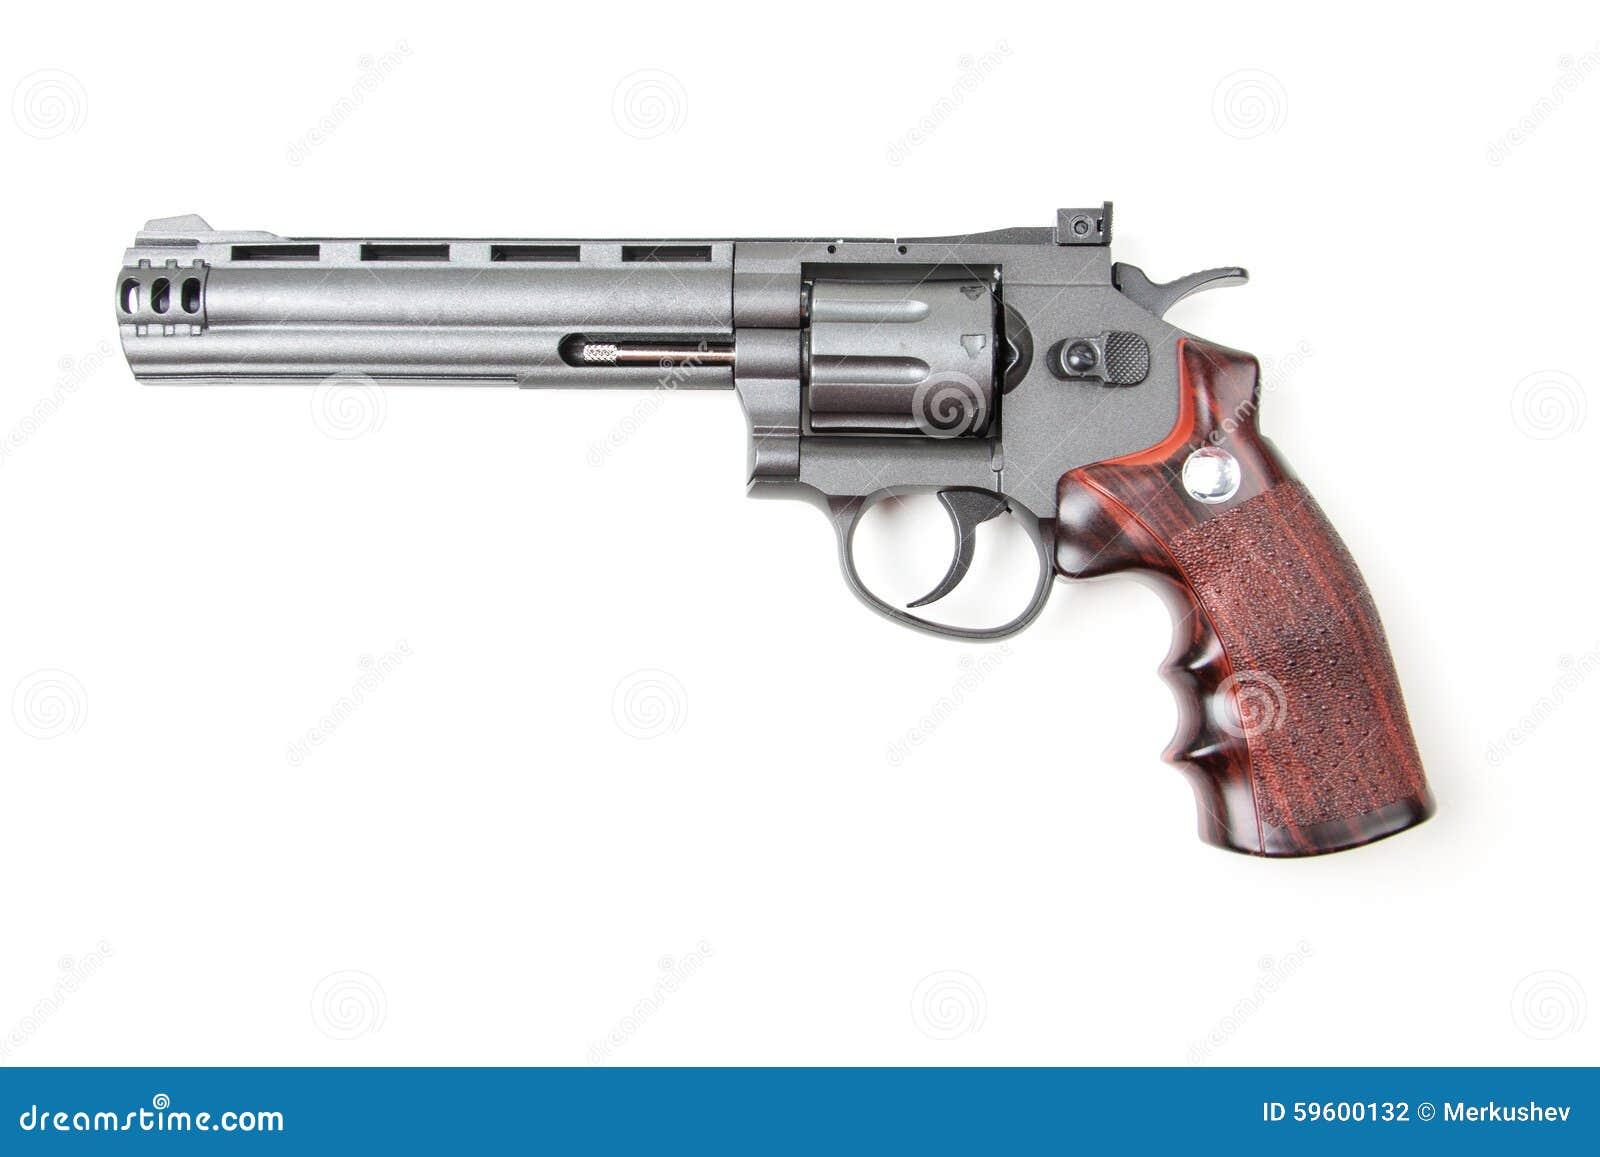 gun white background - photo #12